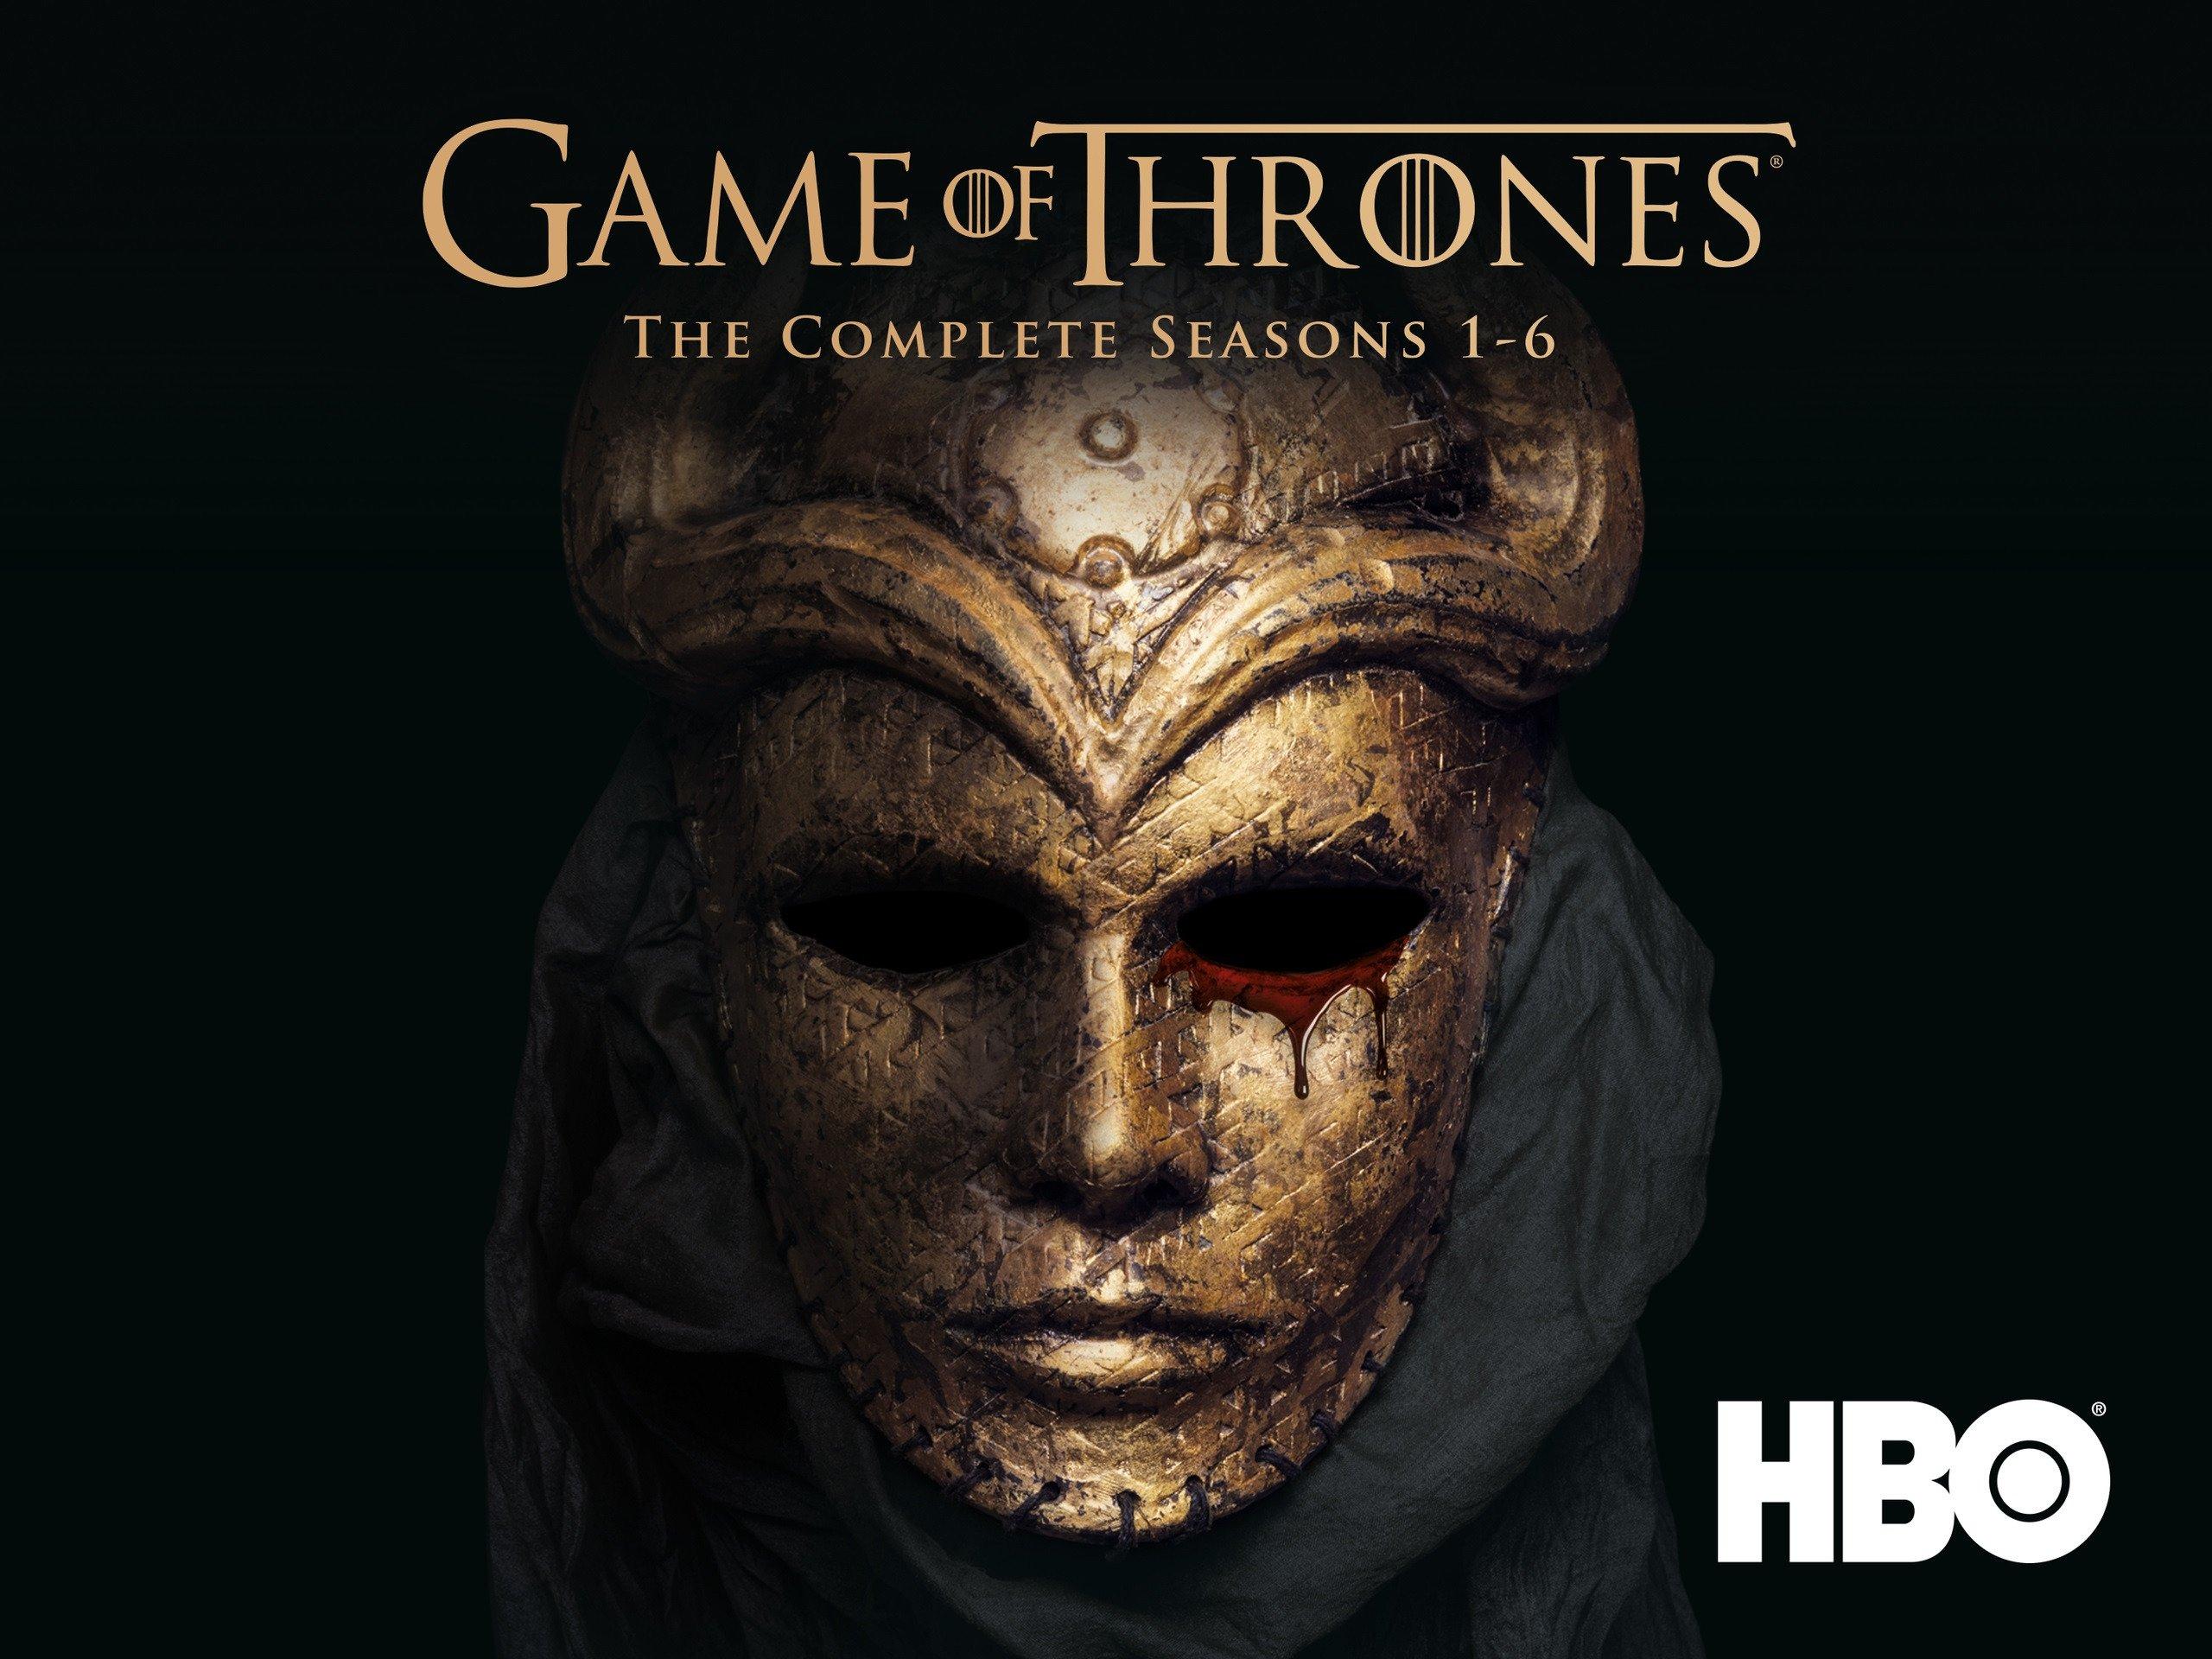 Amazon co uk: Watch Game of Thrones: Seasons 1-6 | Prime Video